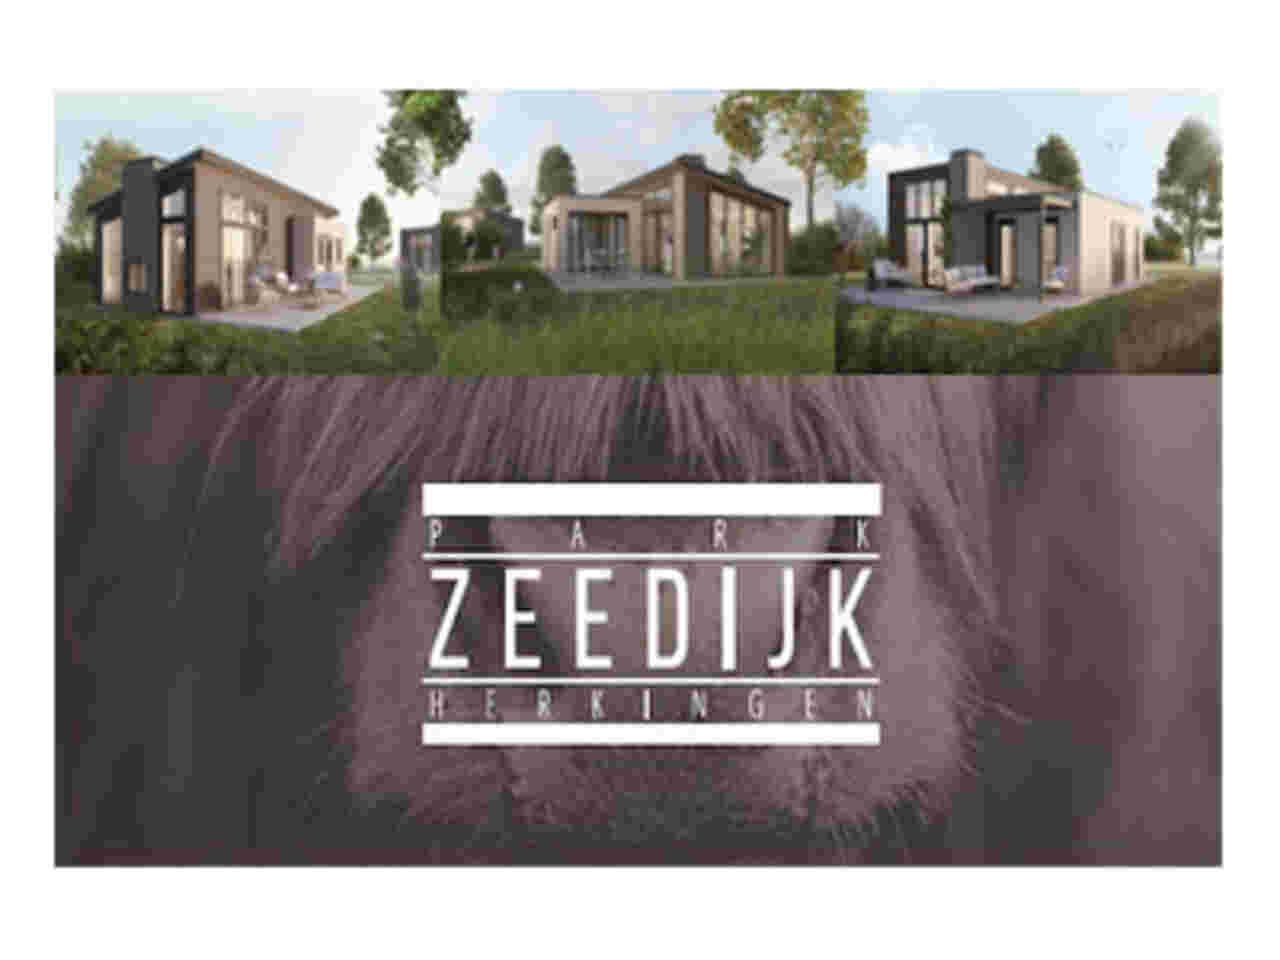 Park Zeedijk